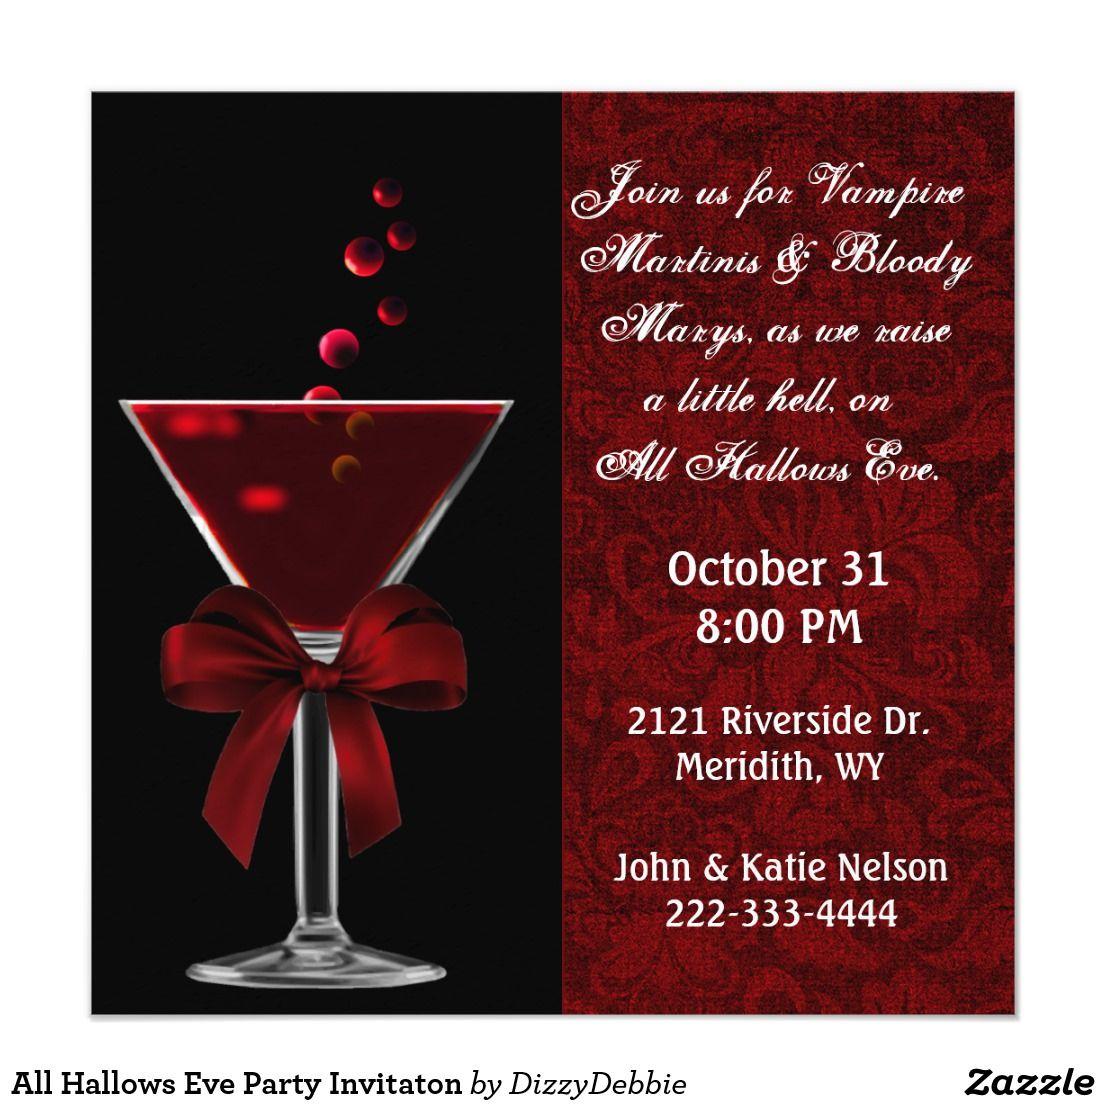 All Hallows Eve Party Invitaton Invitation Zazzle Com Hallows Eve Halloween Party Supplies Adult Halloween Invitations